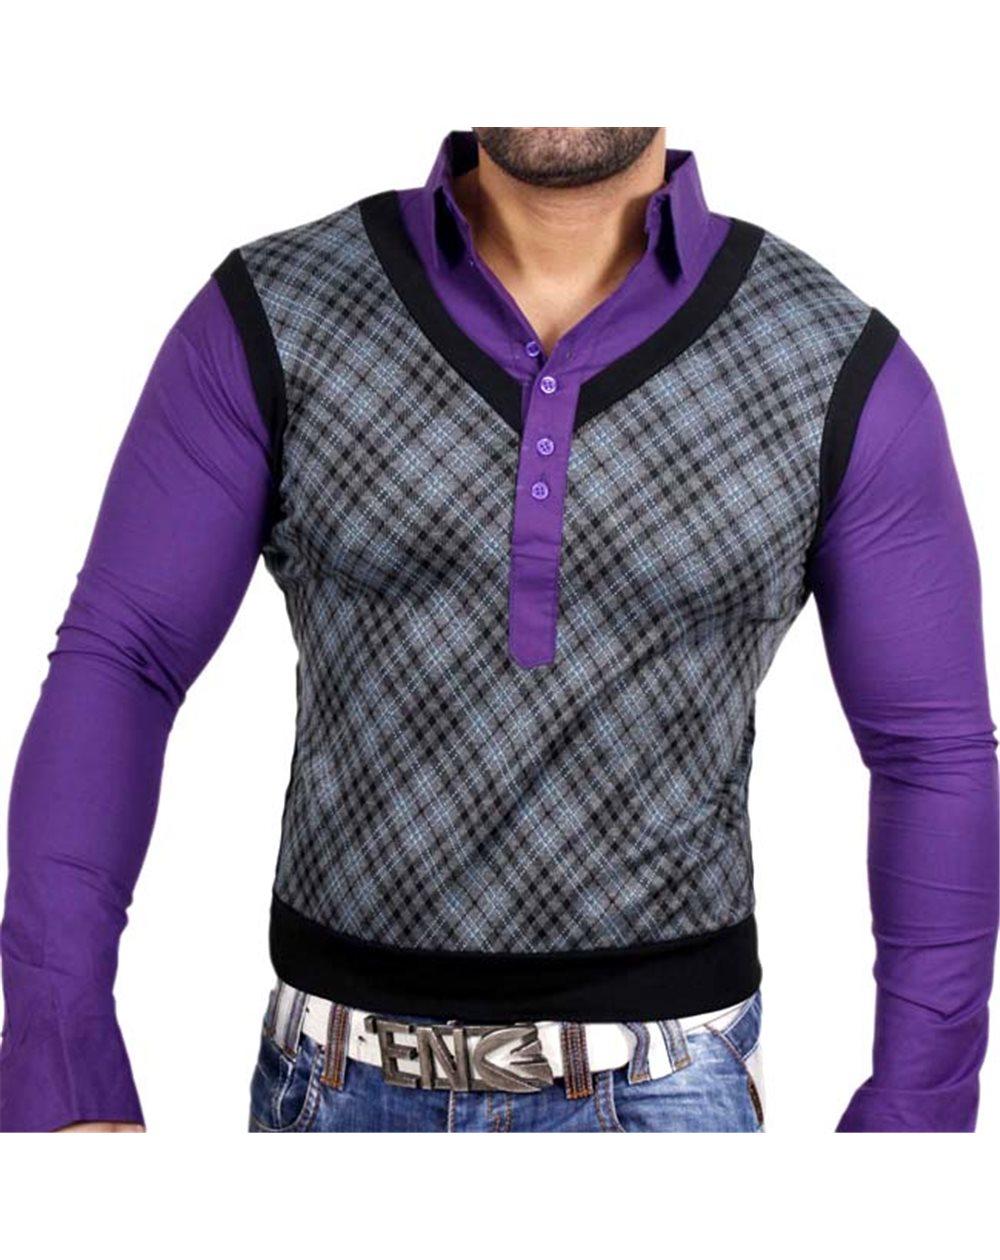 Subliminal Mode - Pull homme leger col V avec chemise cousu 2 en 1 TZ104